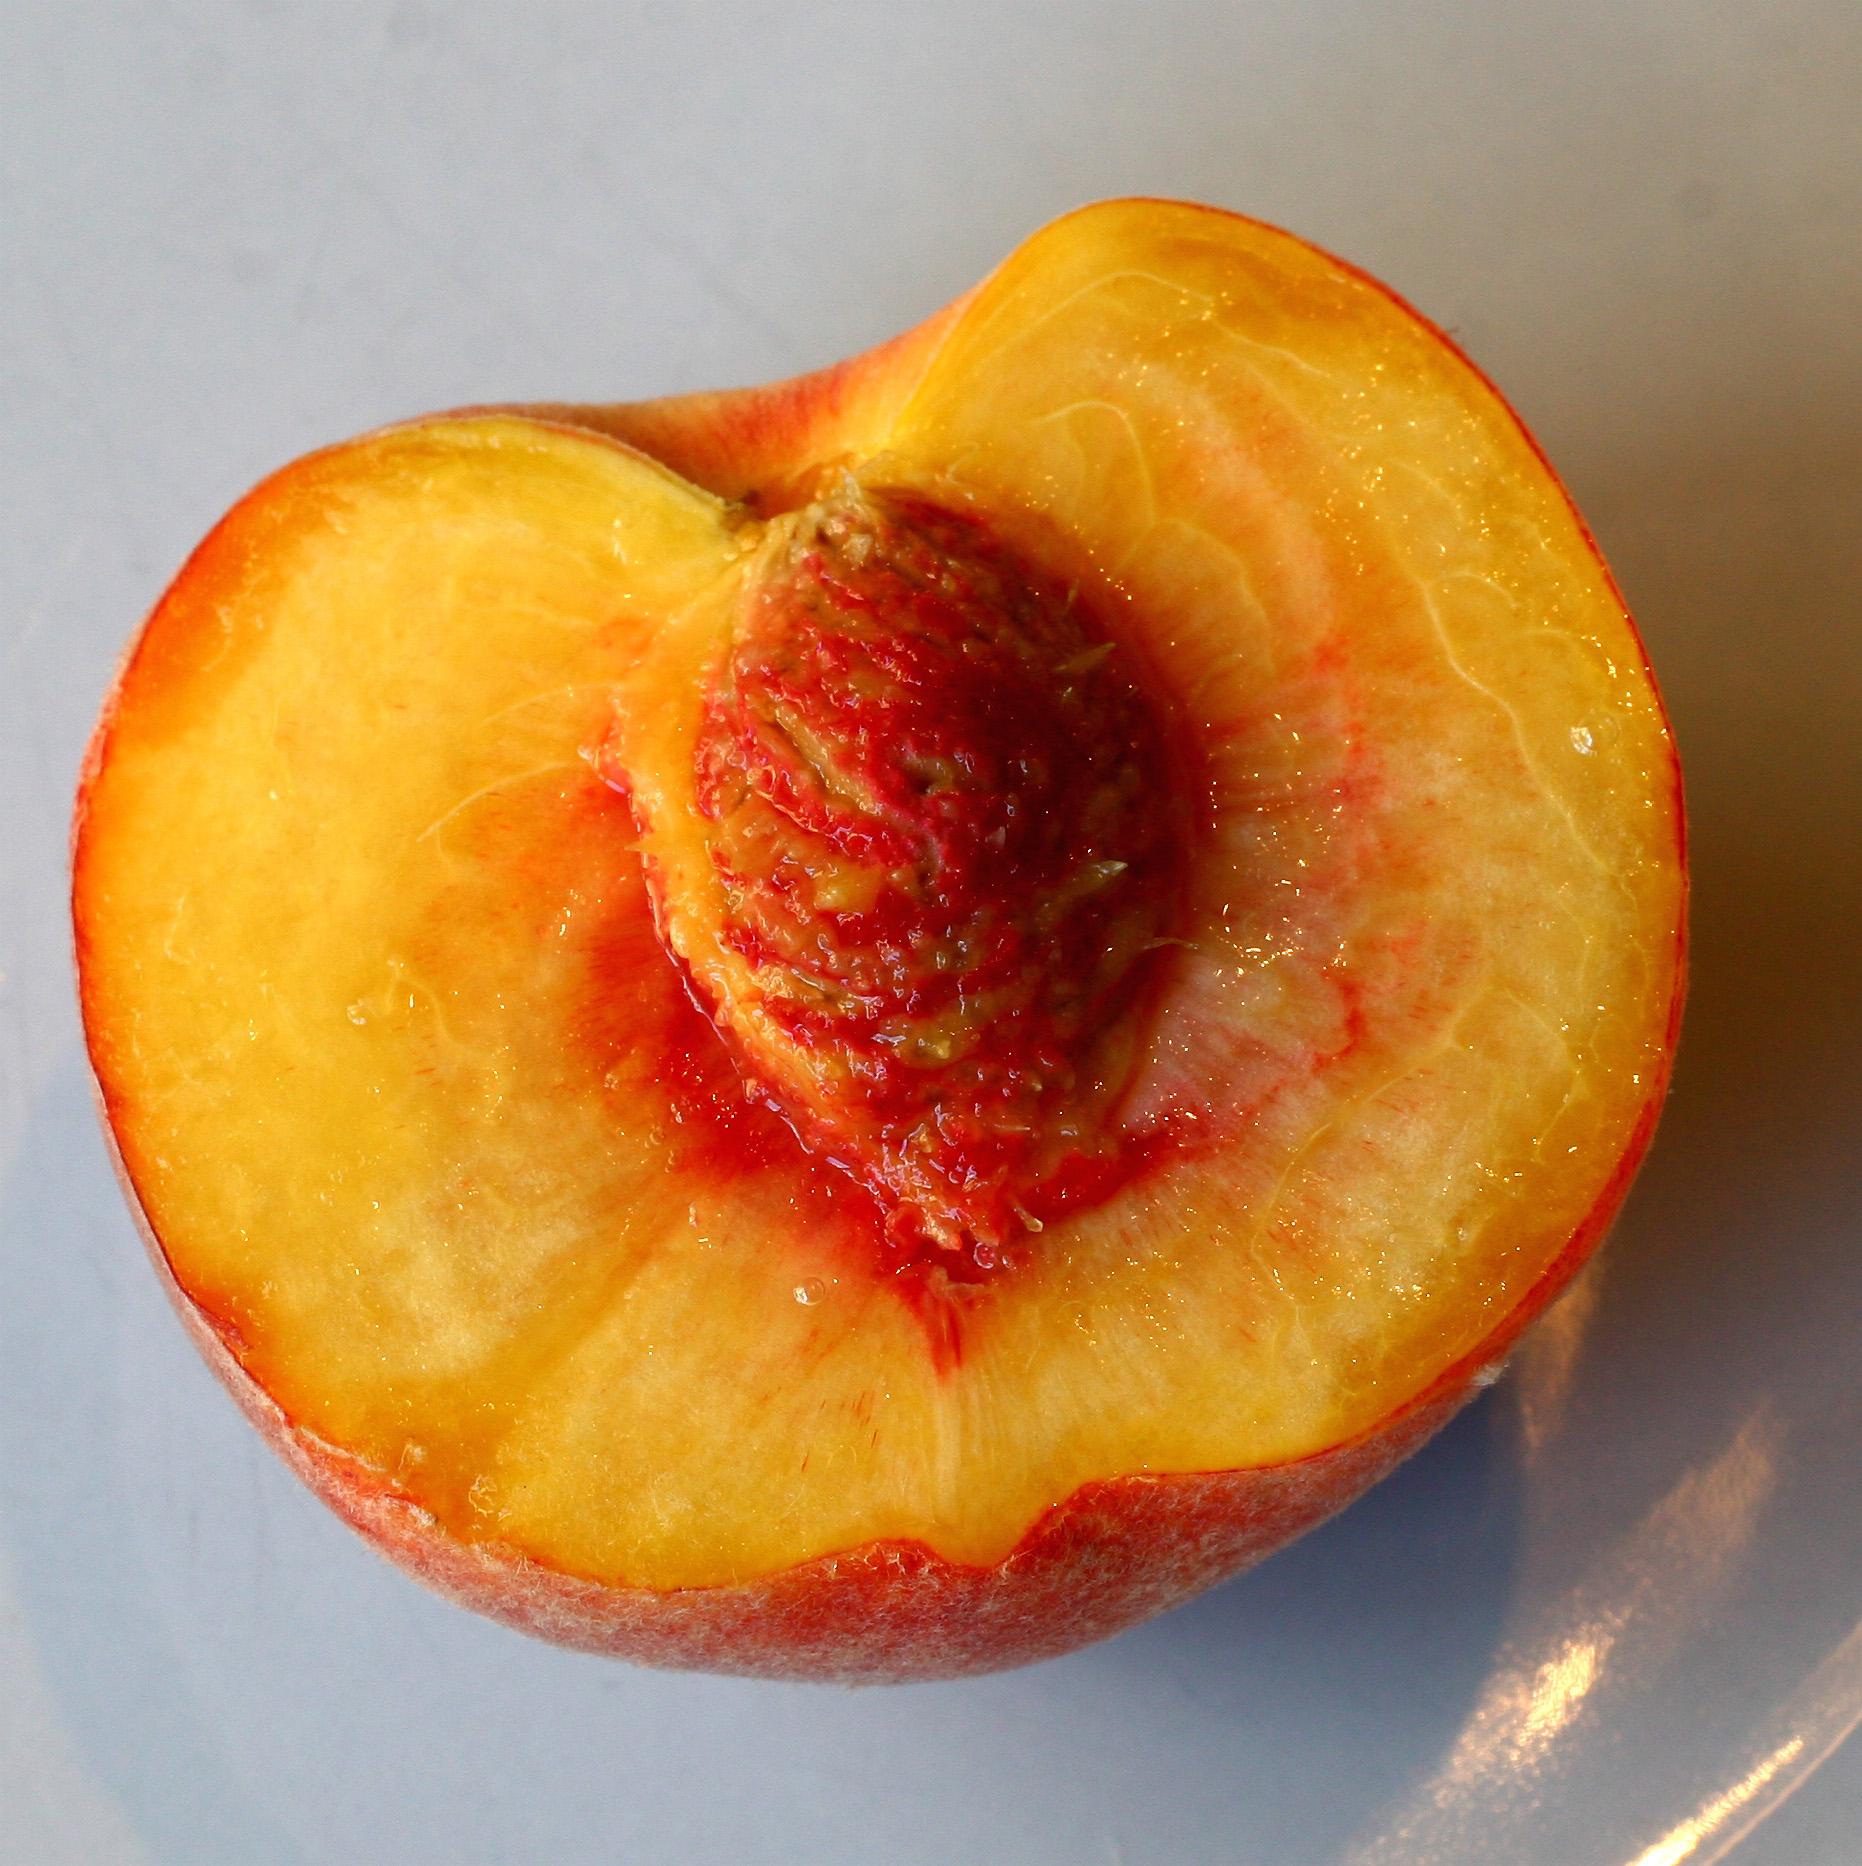 English: juicy peach half